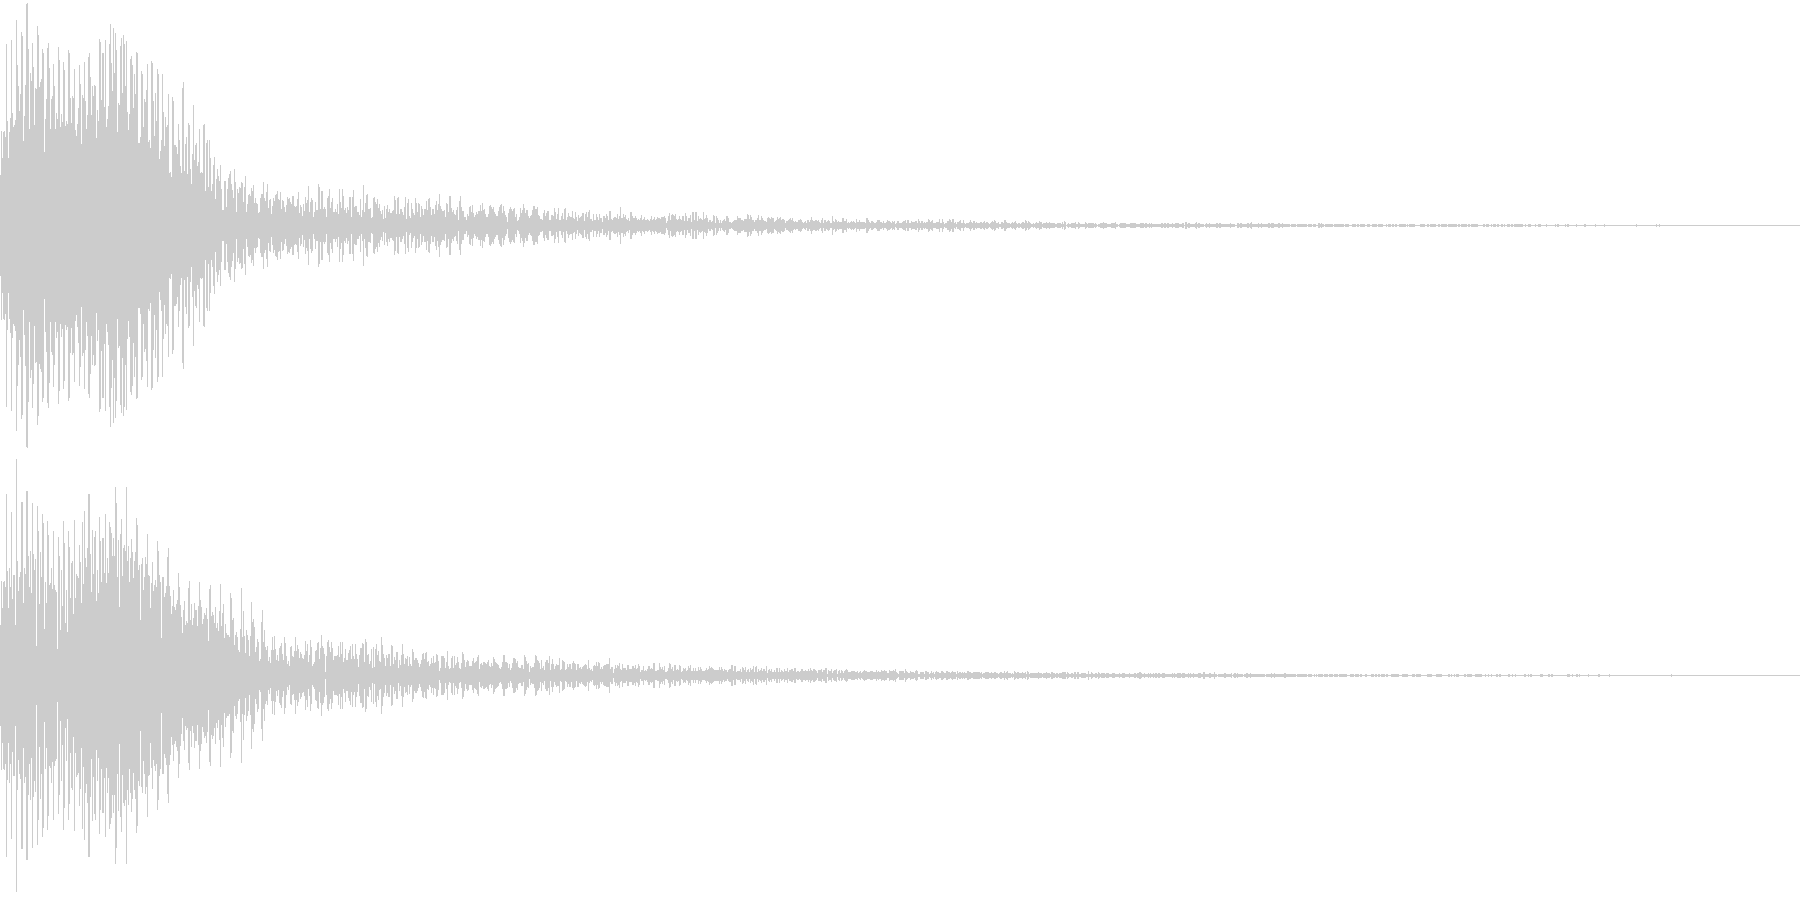 Moog ファットなコマンド音 5の未再生の波形